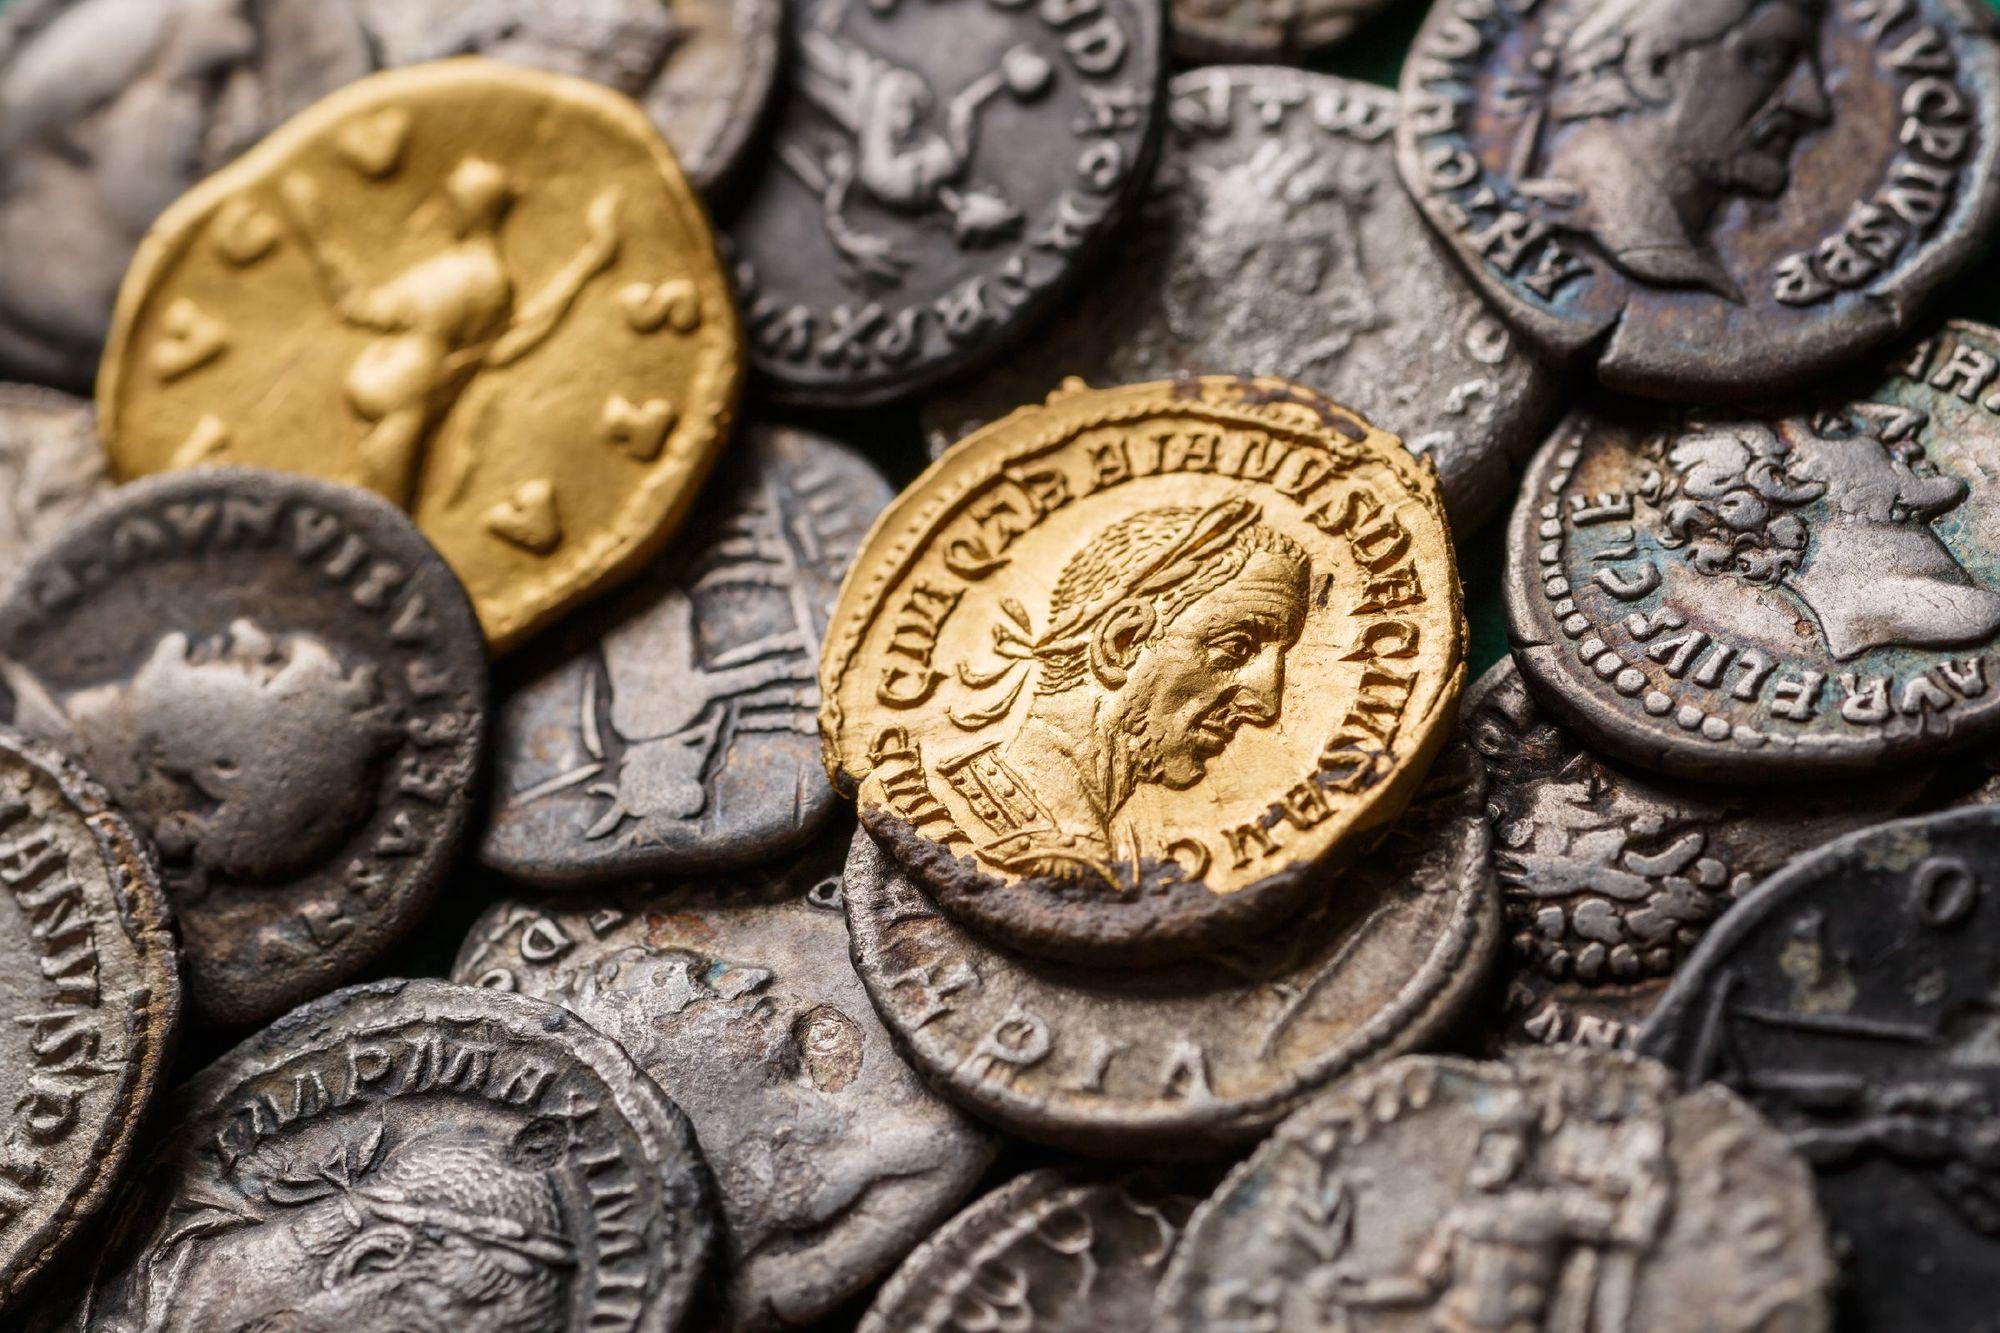 Trajan Decius among Roman gold and silver